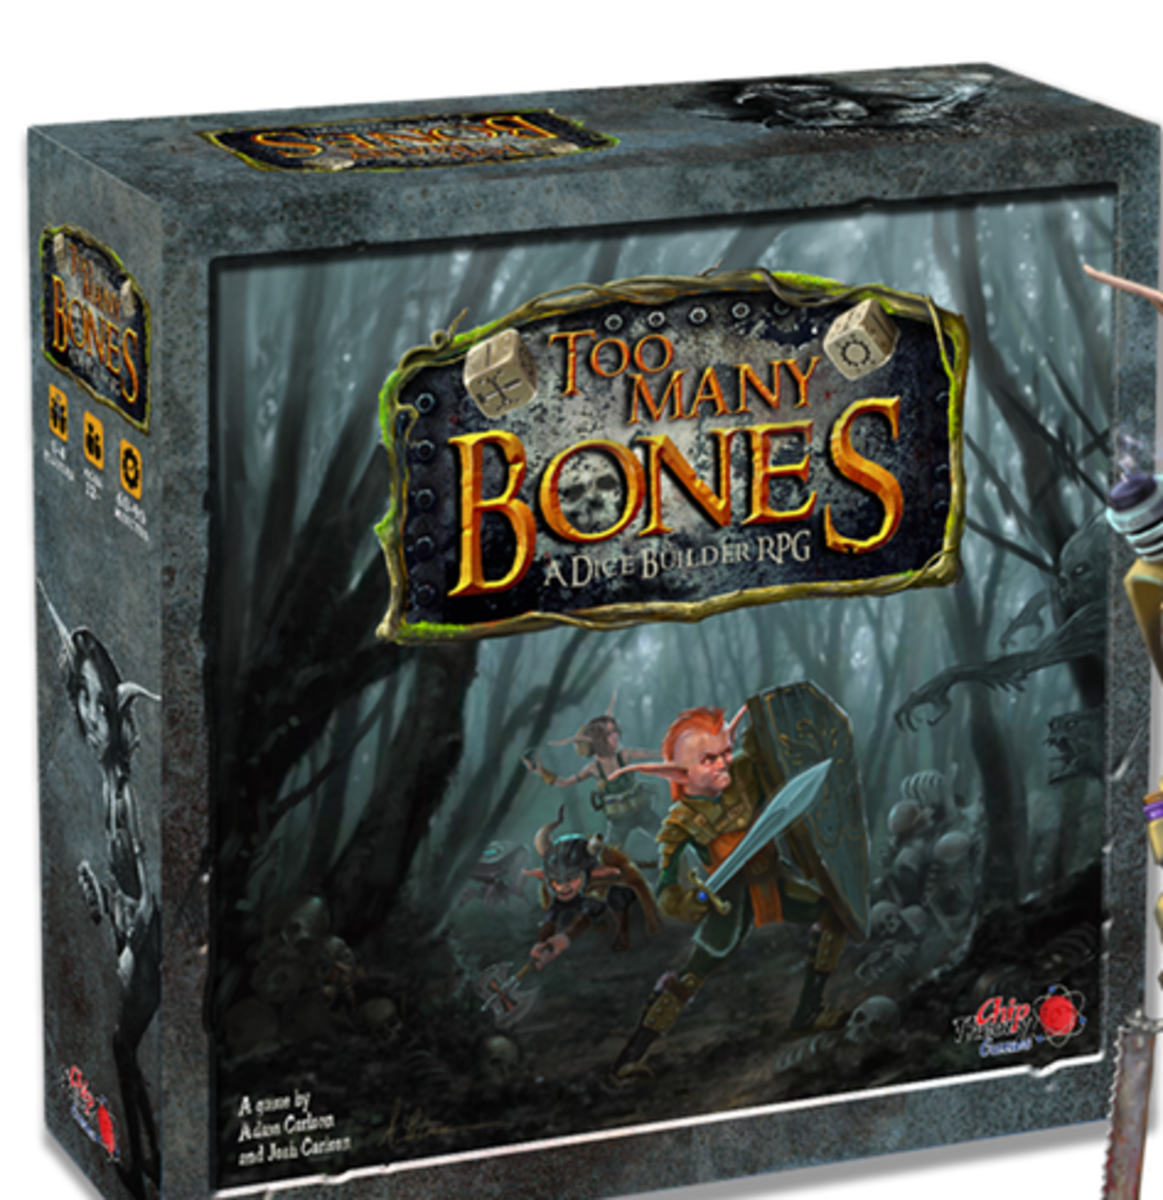 Too Many Bones: A Dice-Builder RPG